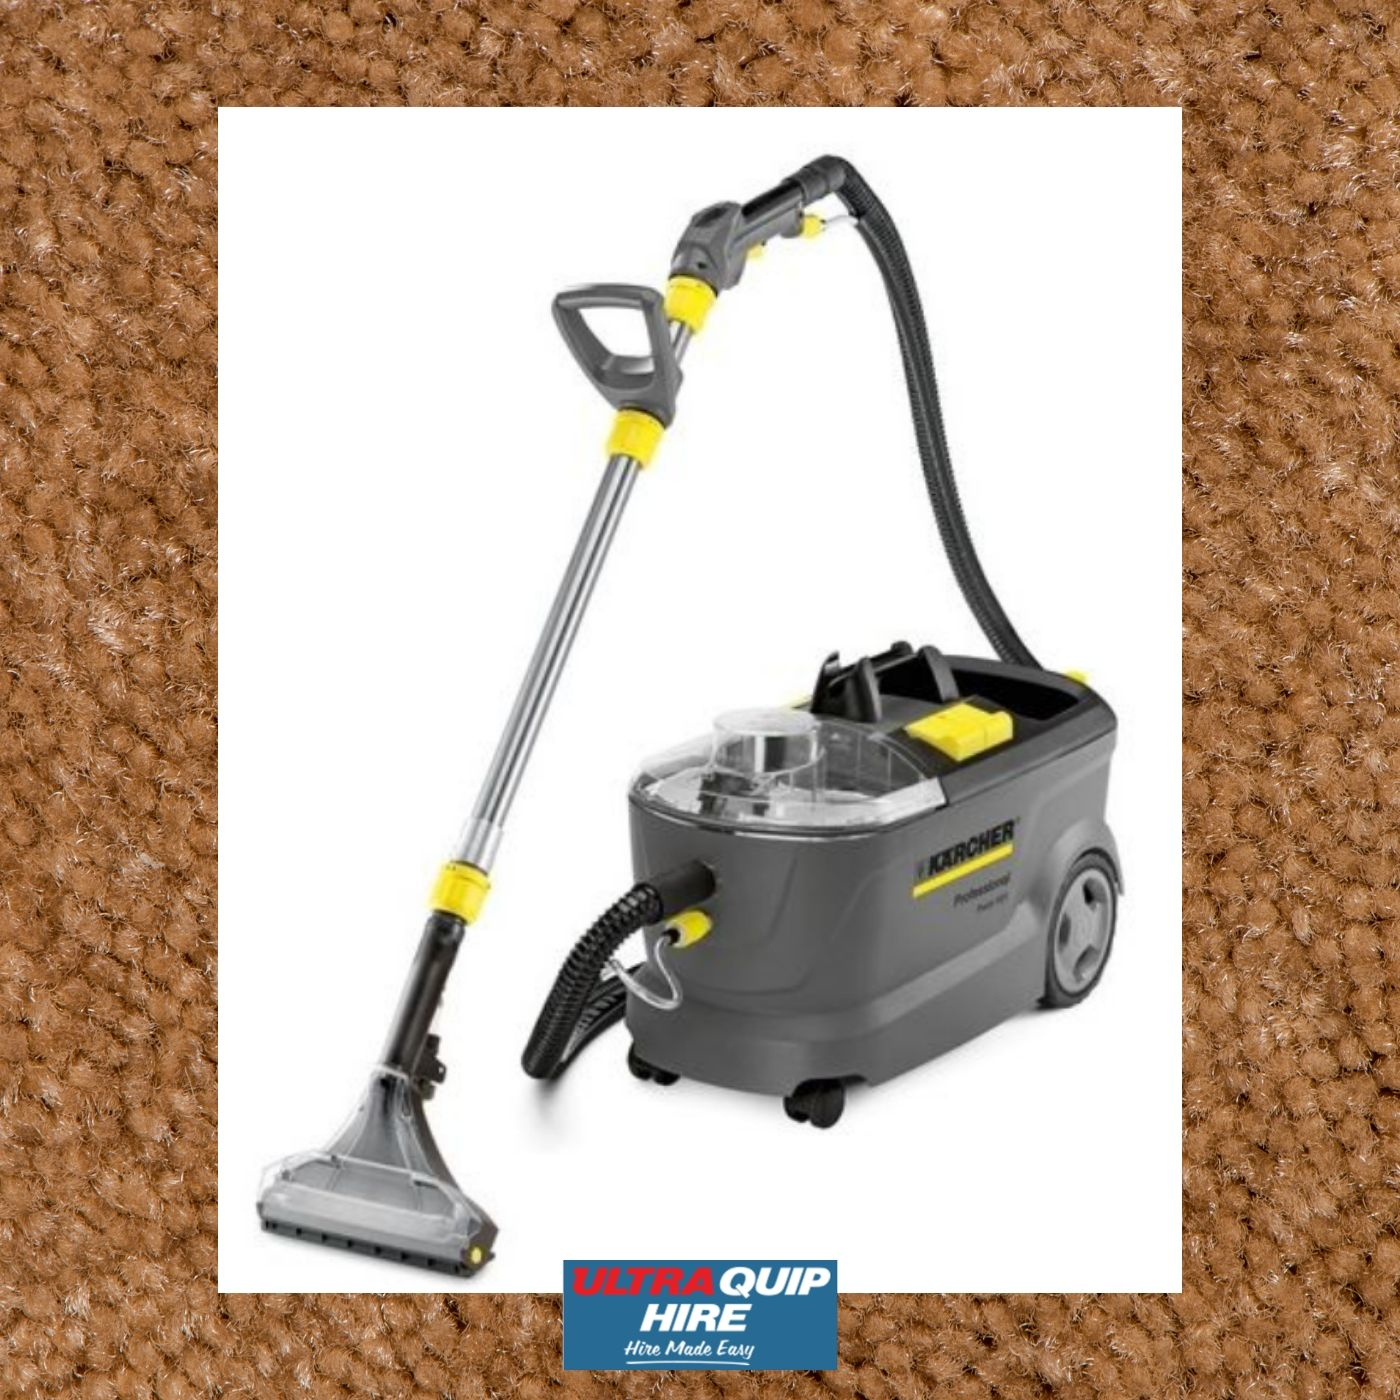 Ultraquip Blenheim carpet cleaner Rug doctor hire rent kennards Hirepool